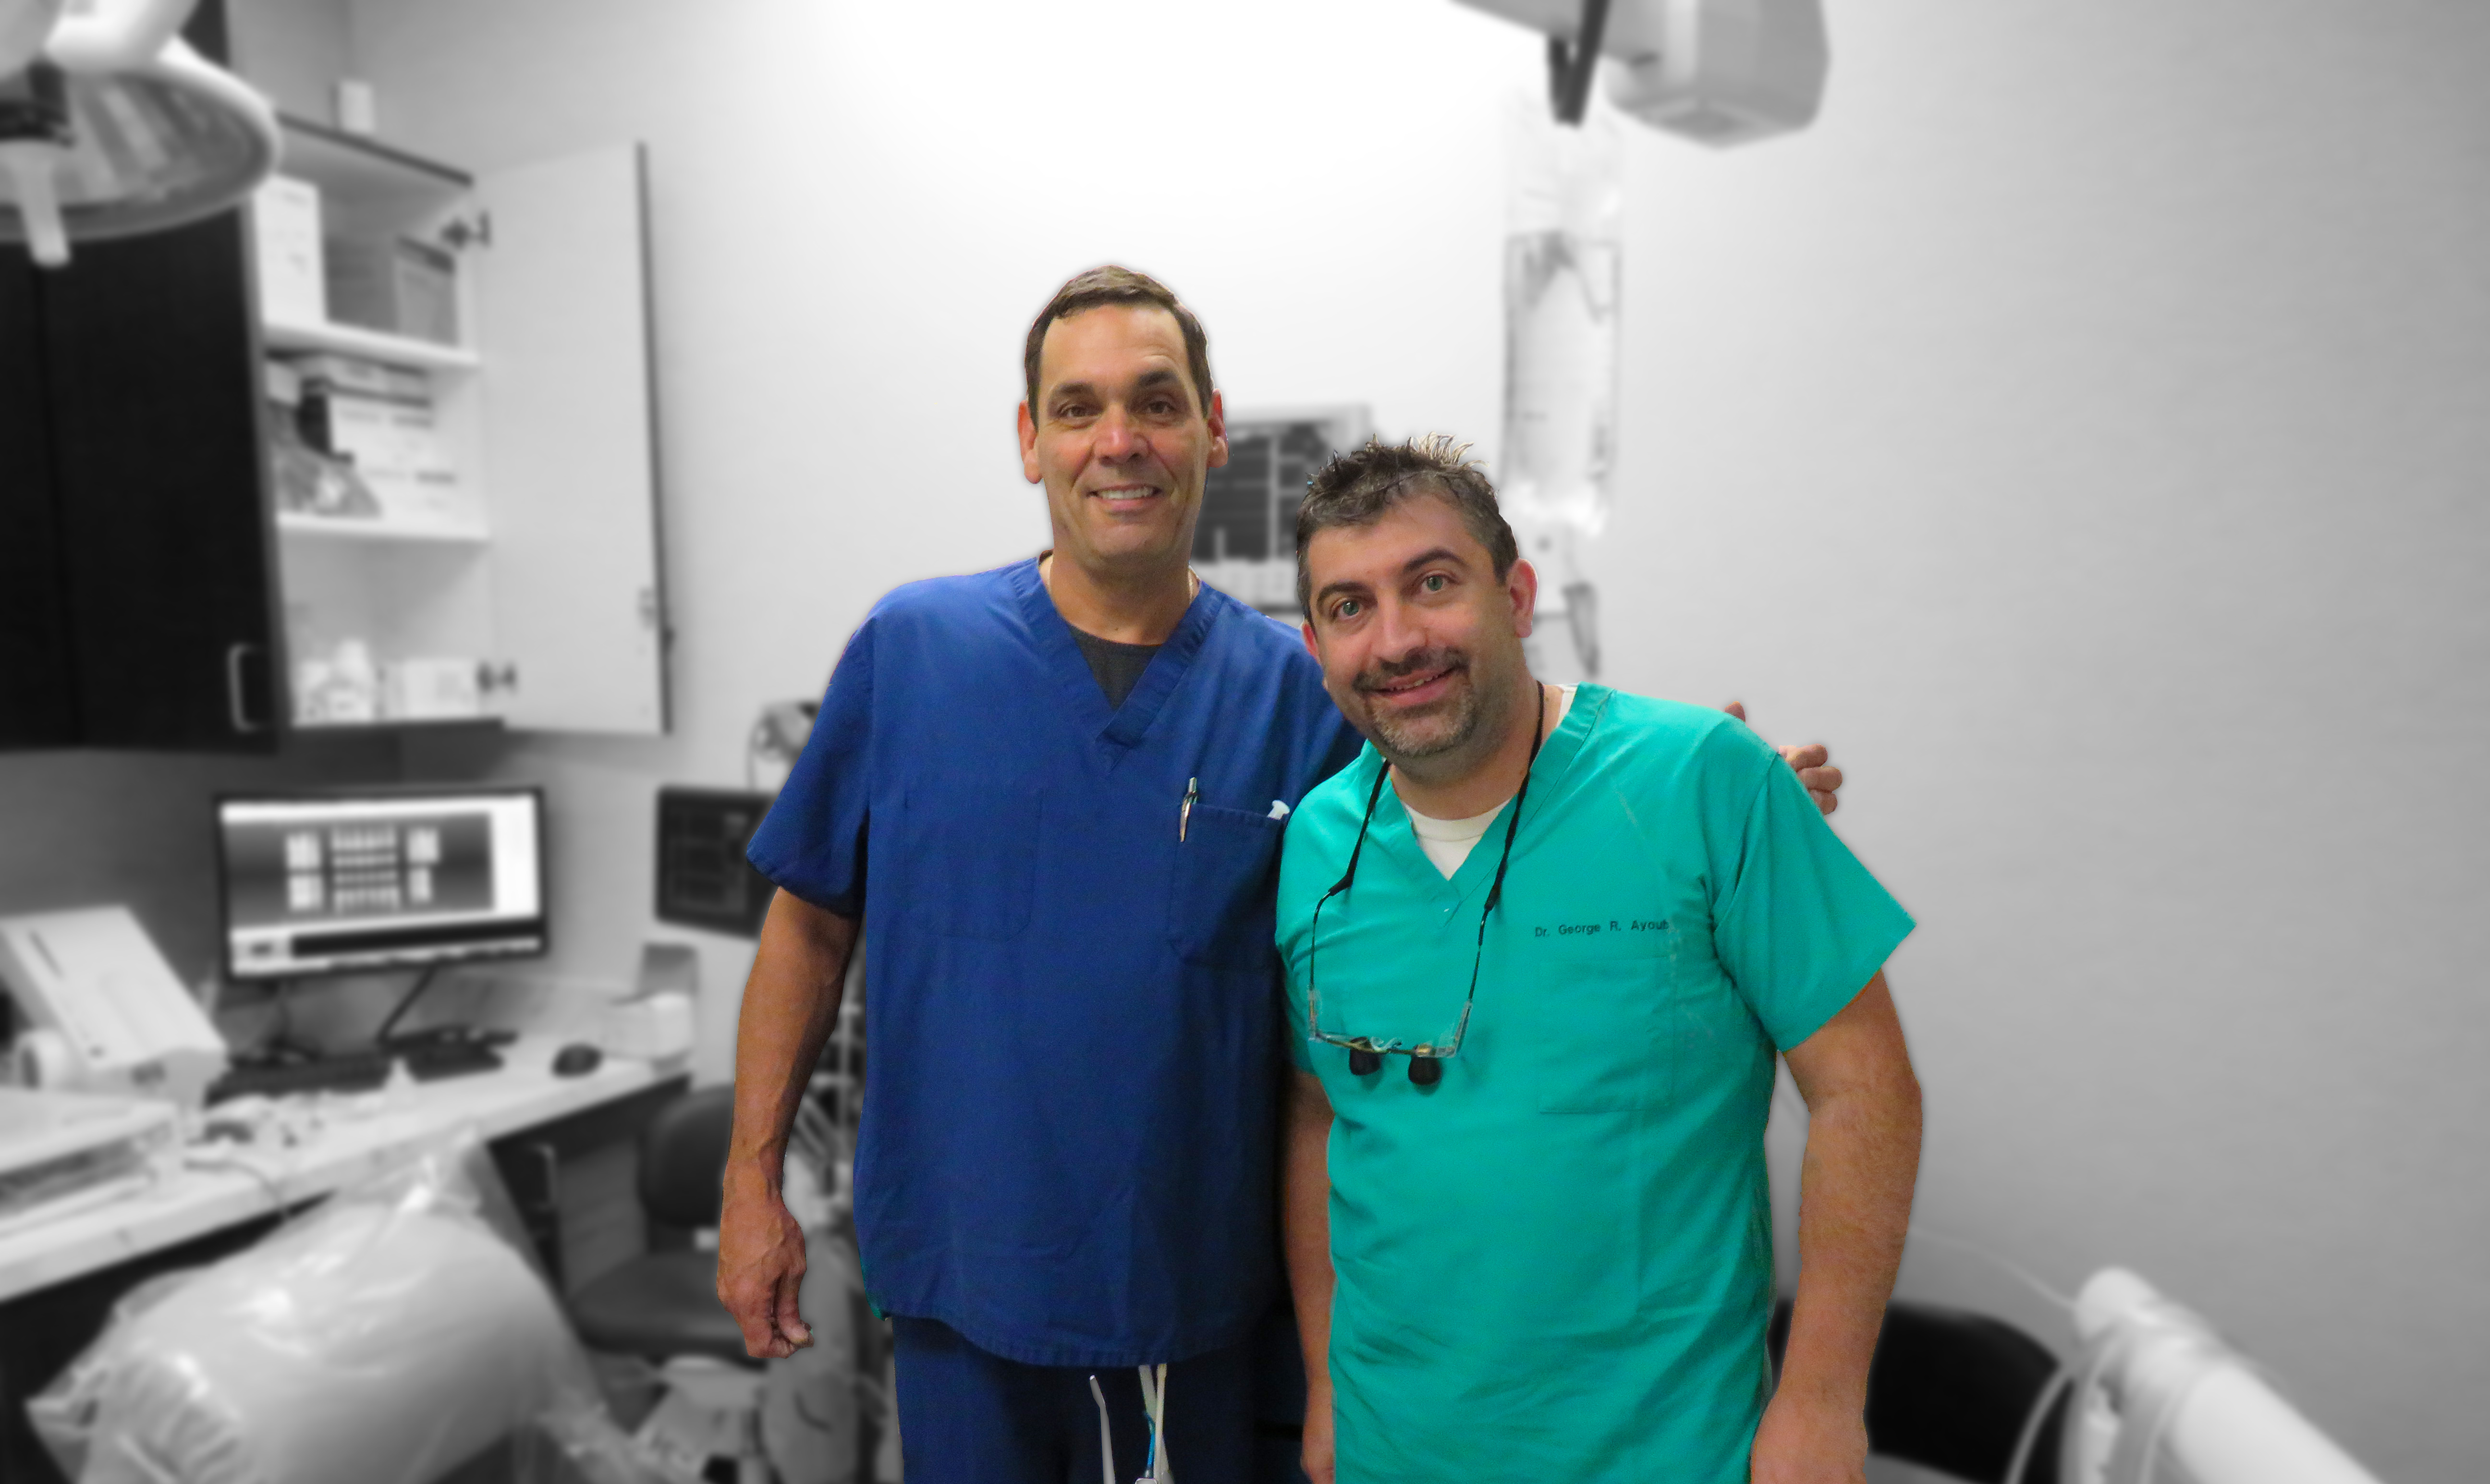 Dr. Vermeys | Dr. Ayoub